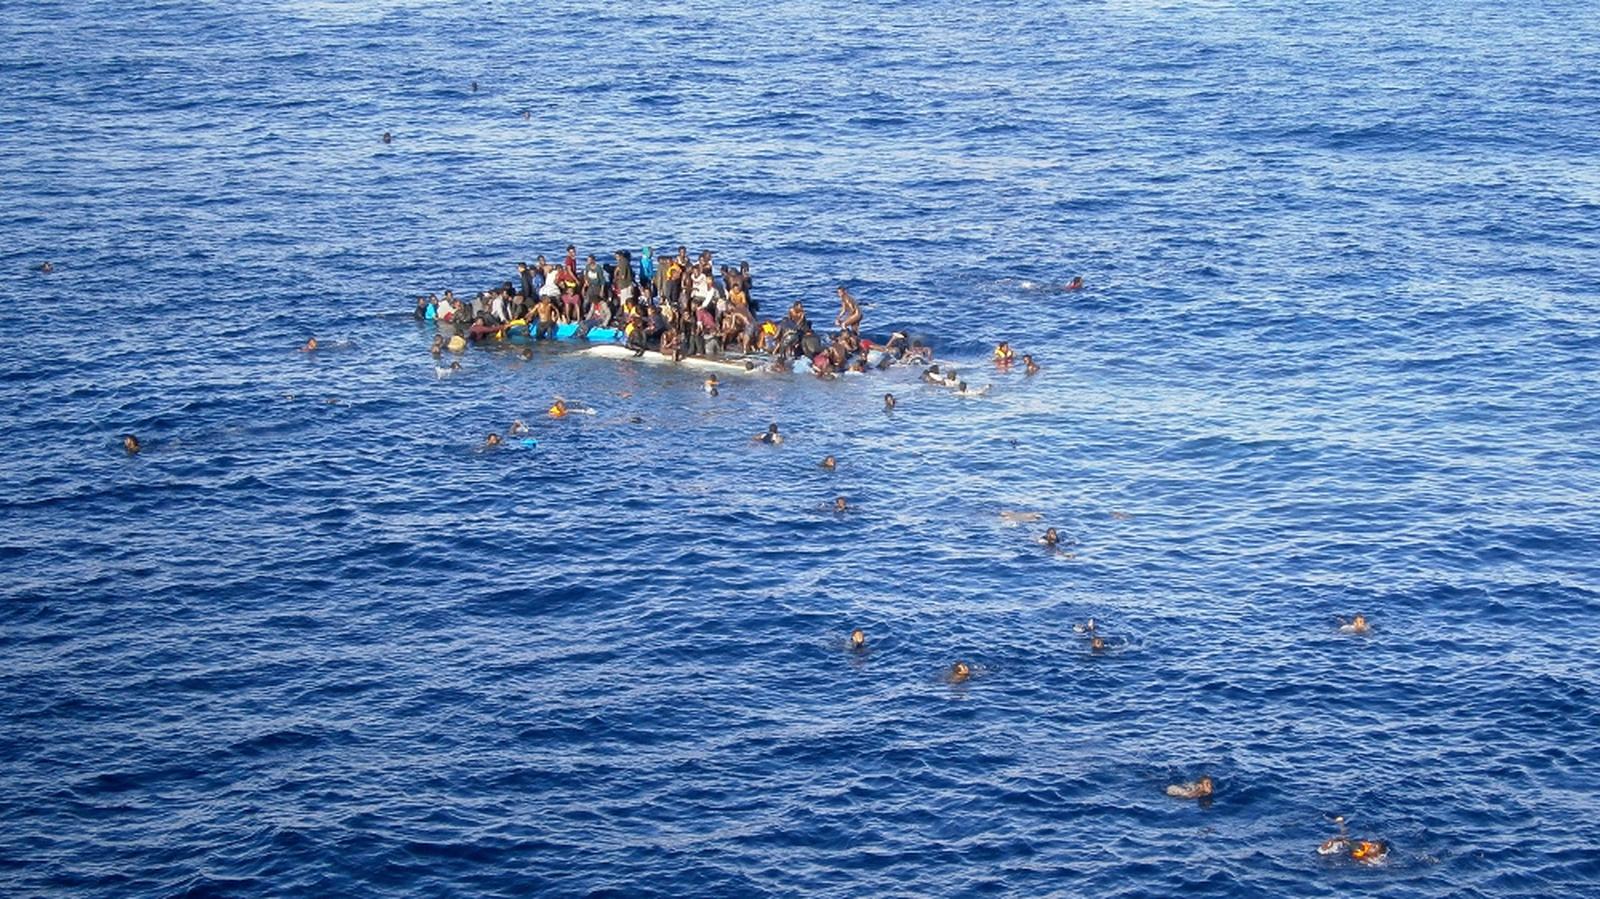 Migration crisis: European ministers discuss refugee